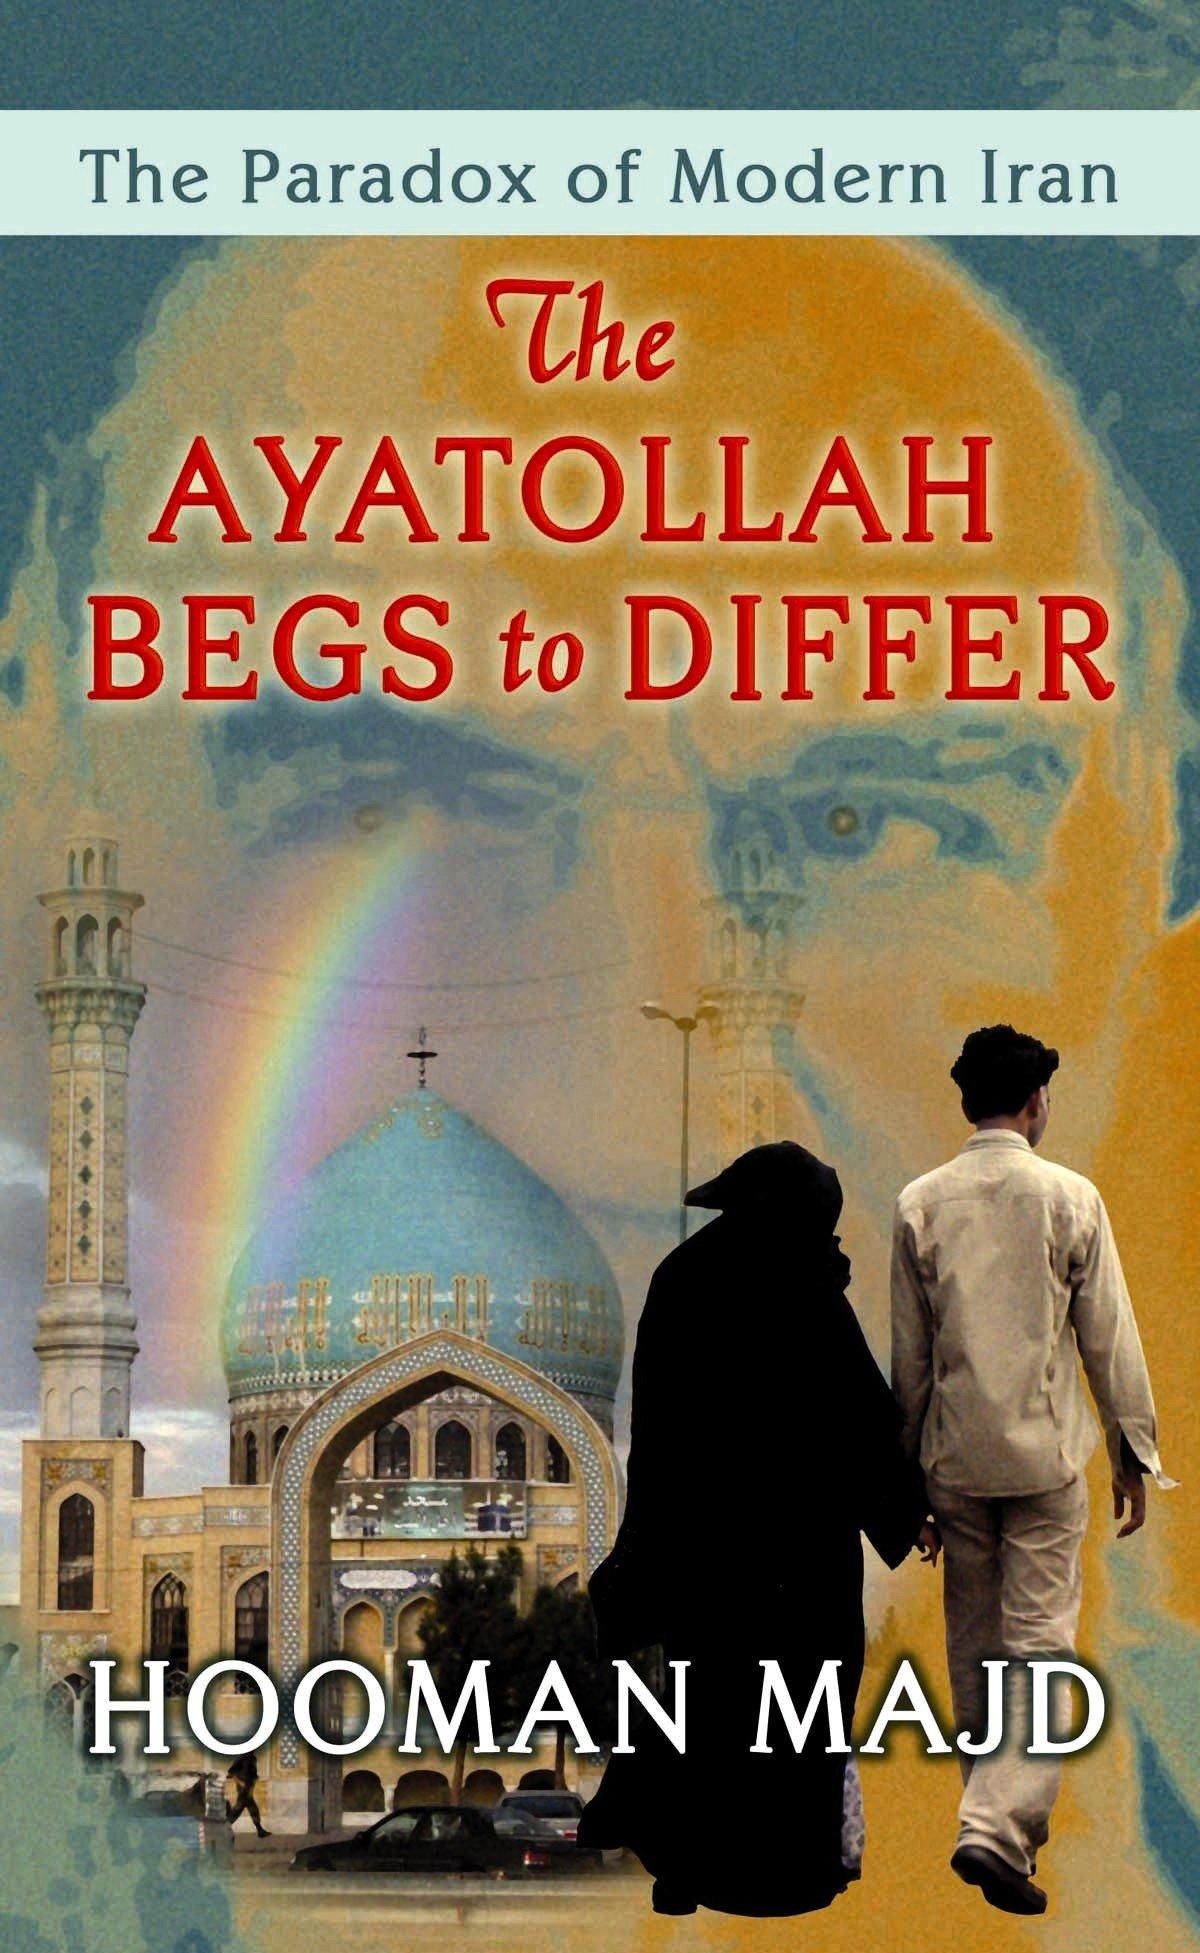 The Ayatollah Begs to Differ: The Paradox of Modern Iran (Readers Circle Series) pdf